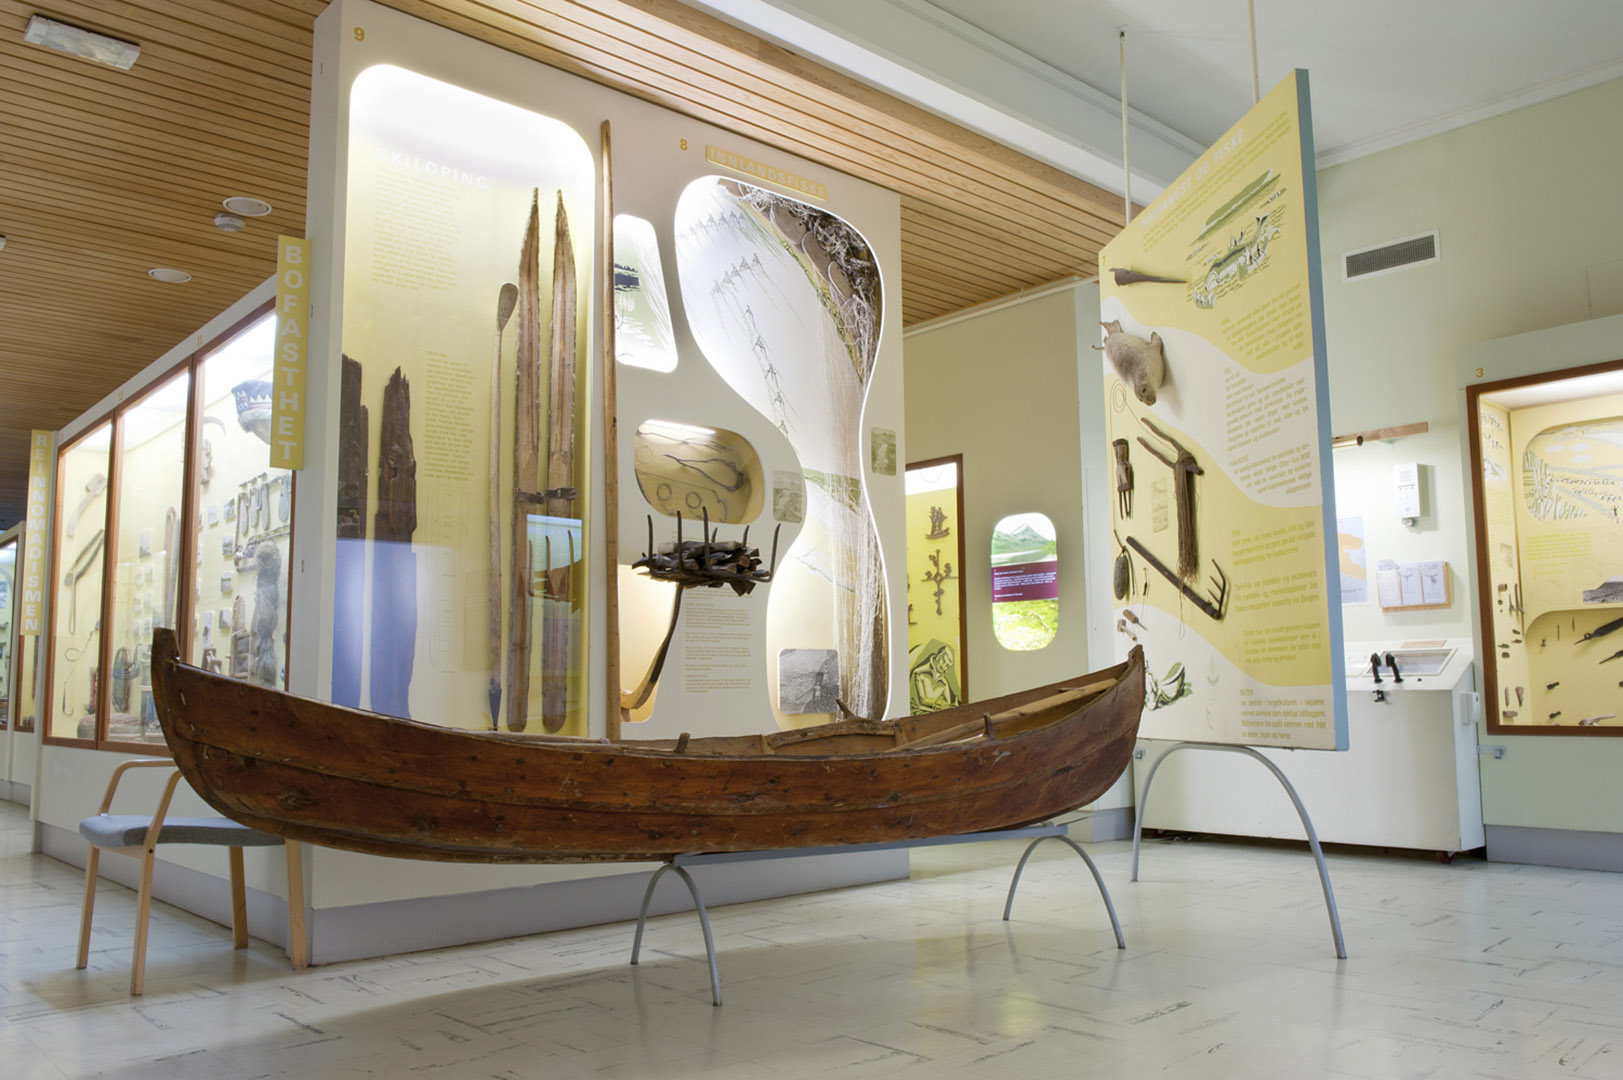 Troms¢Universitetsmuseum_1_Boat_PhotoJuneAasheim_Scan-Magazine-May-2019